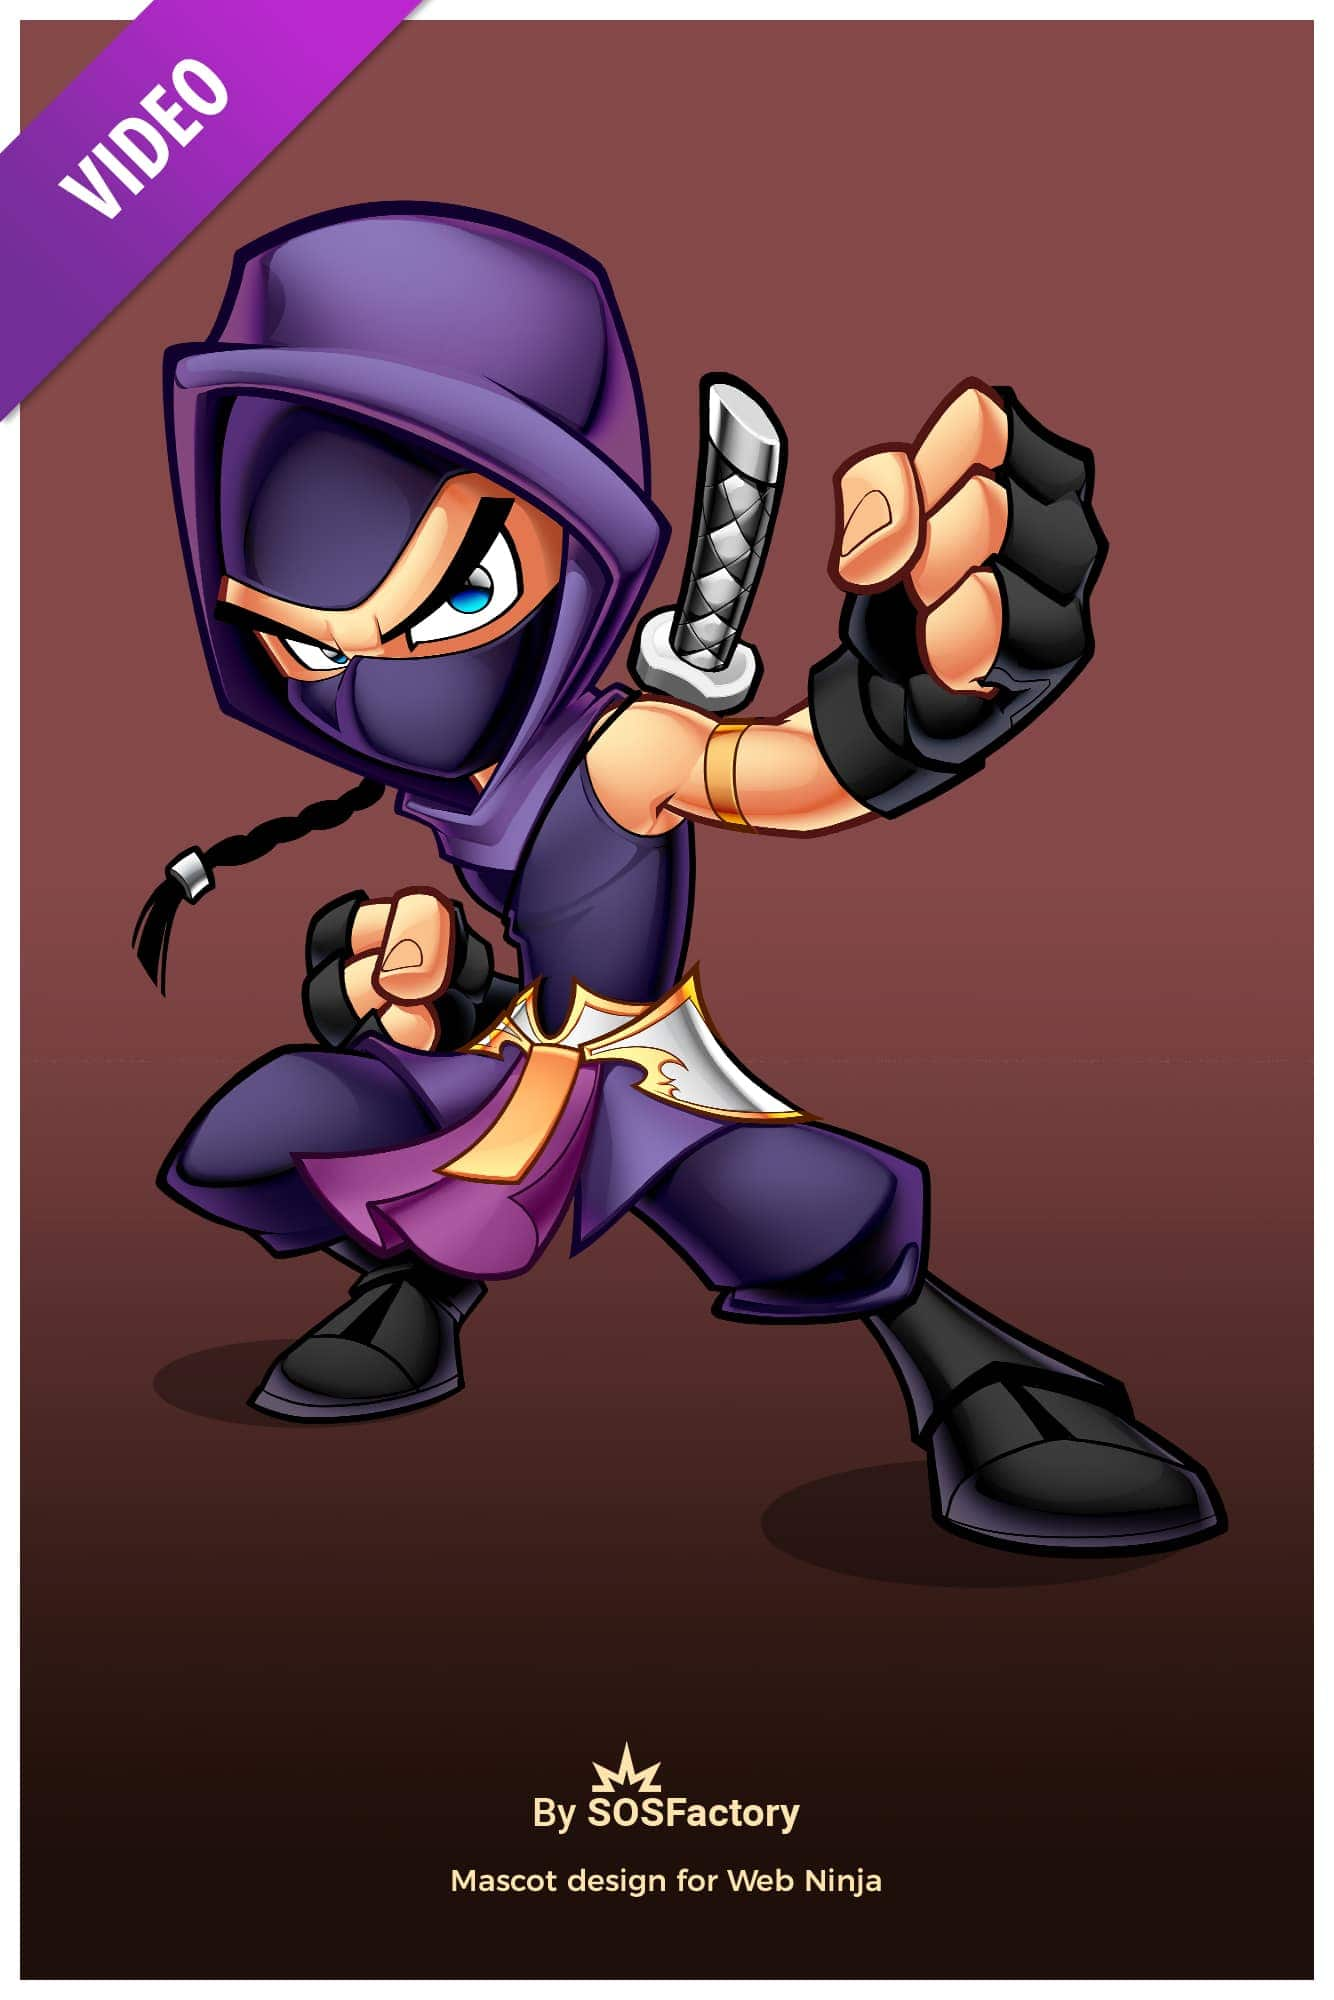 web ninja mascot design